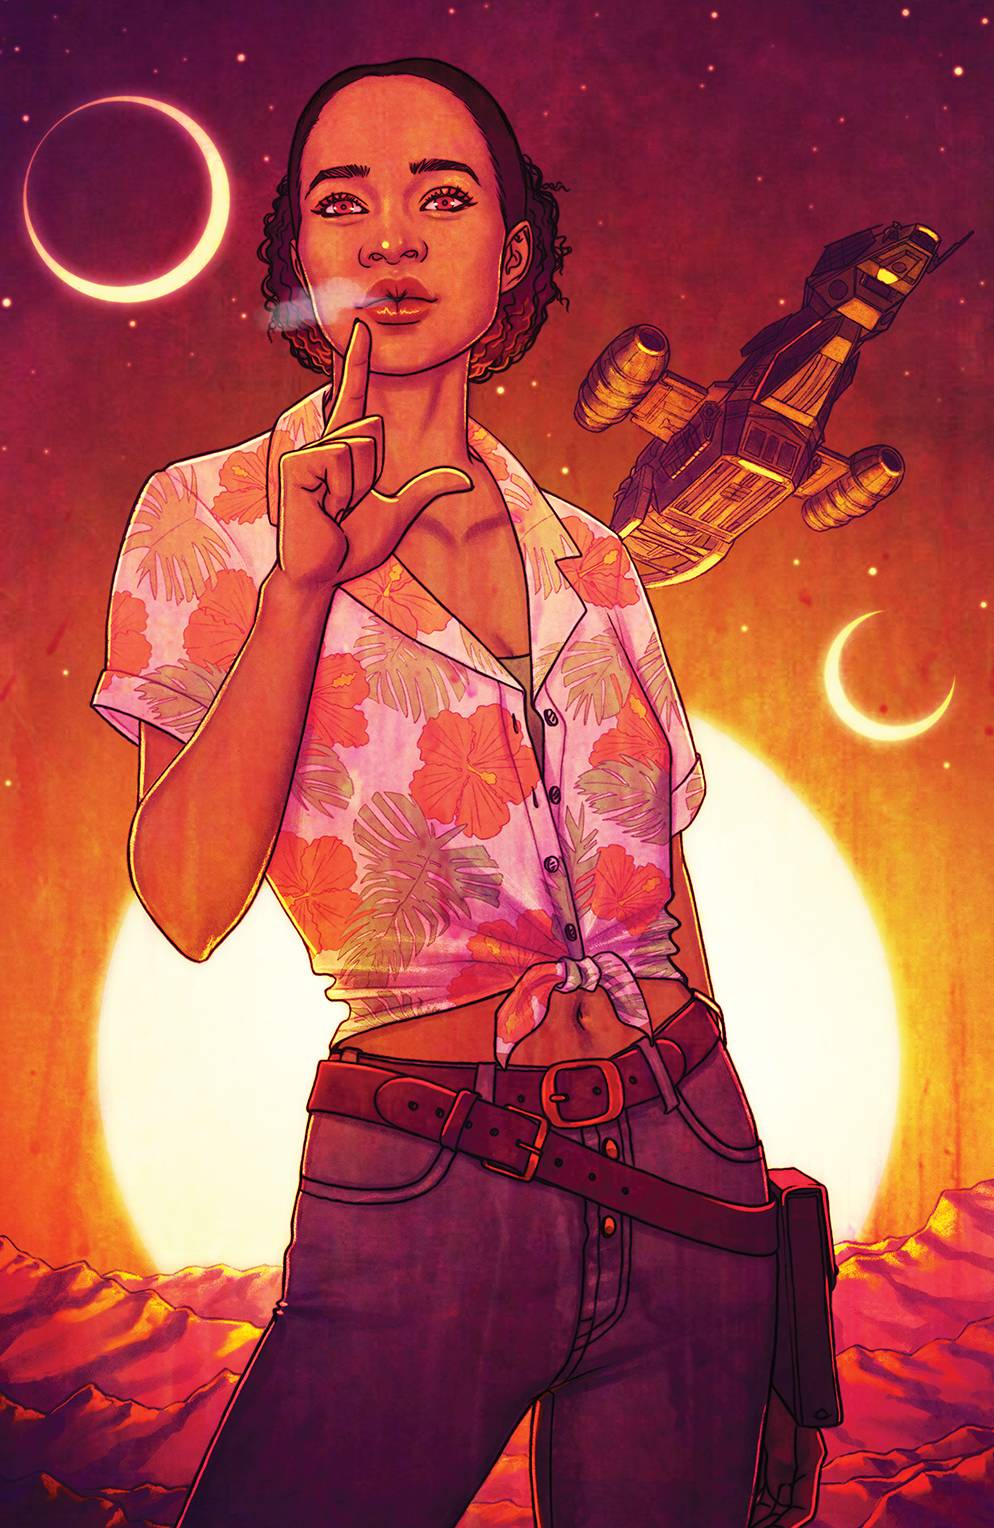 STL180097 ComicList Previews: FIREFLY BRAND NEW 'VERSE #1